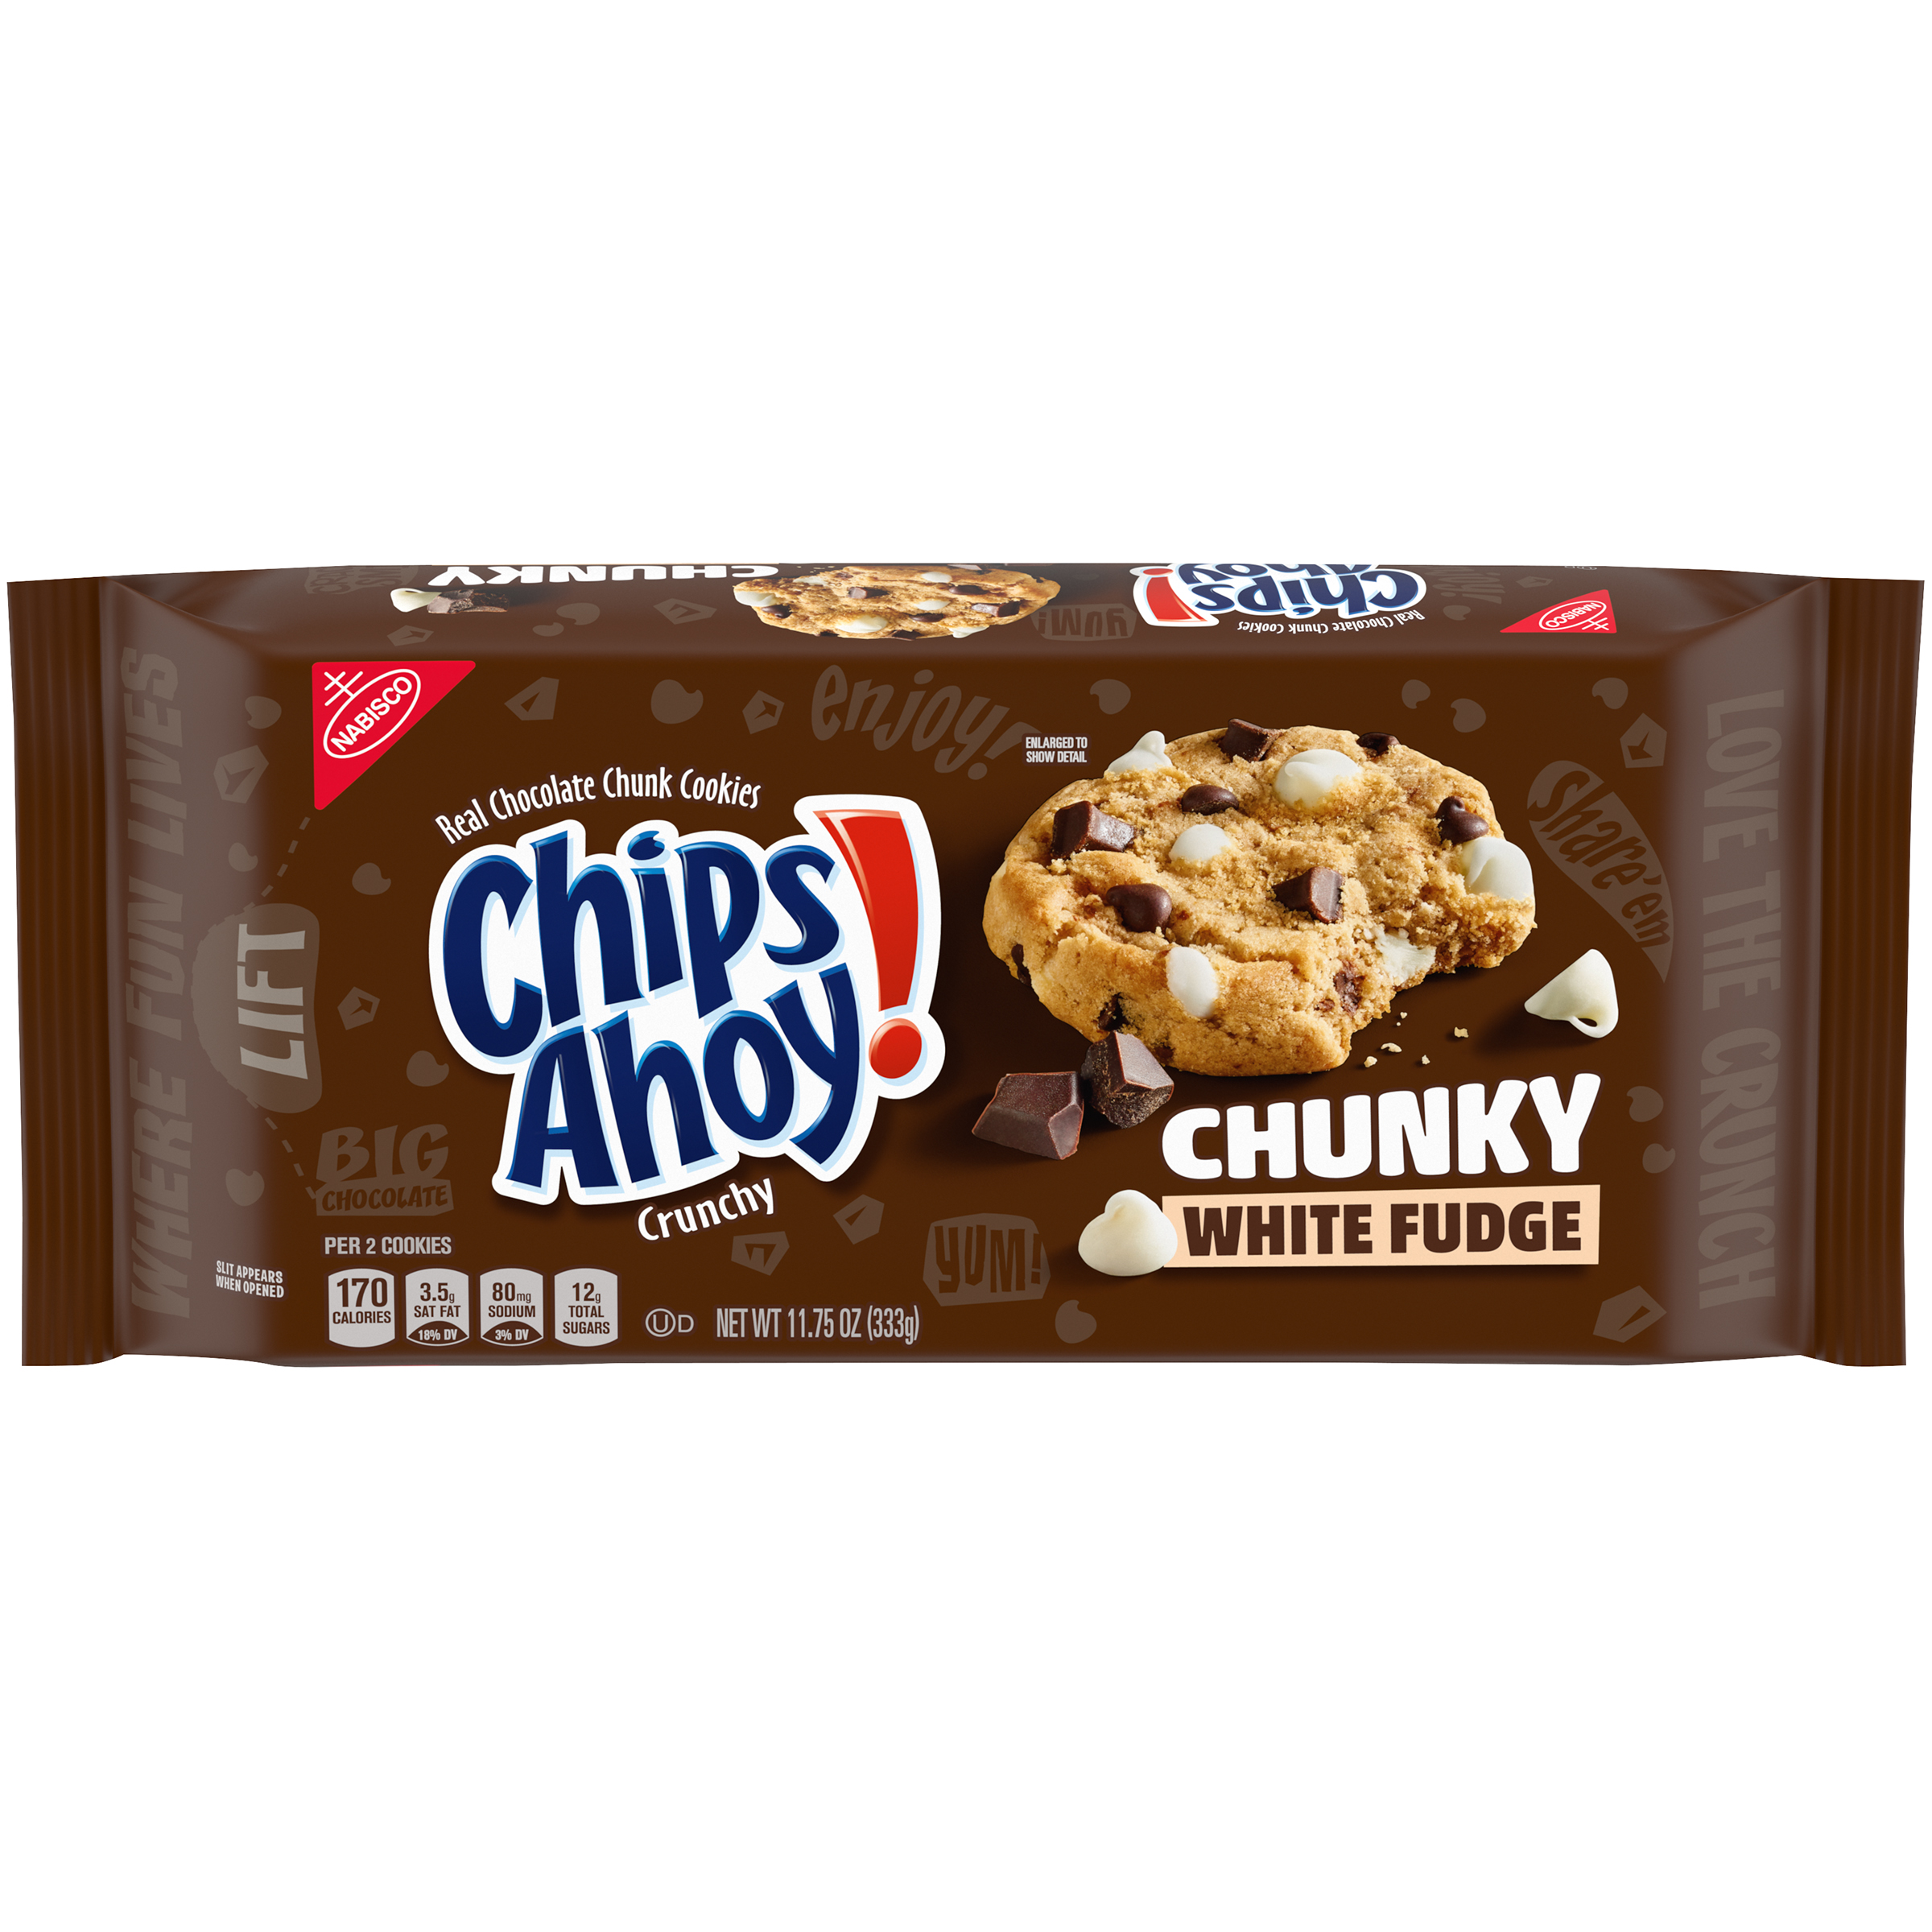 CHIPS AHOY! Chunky Chunky White Fudge Cookies 11.75 oz